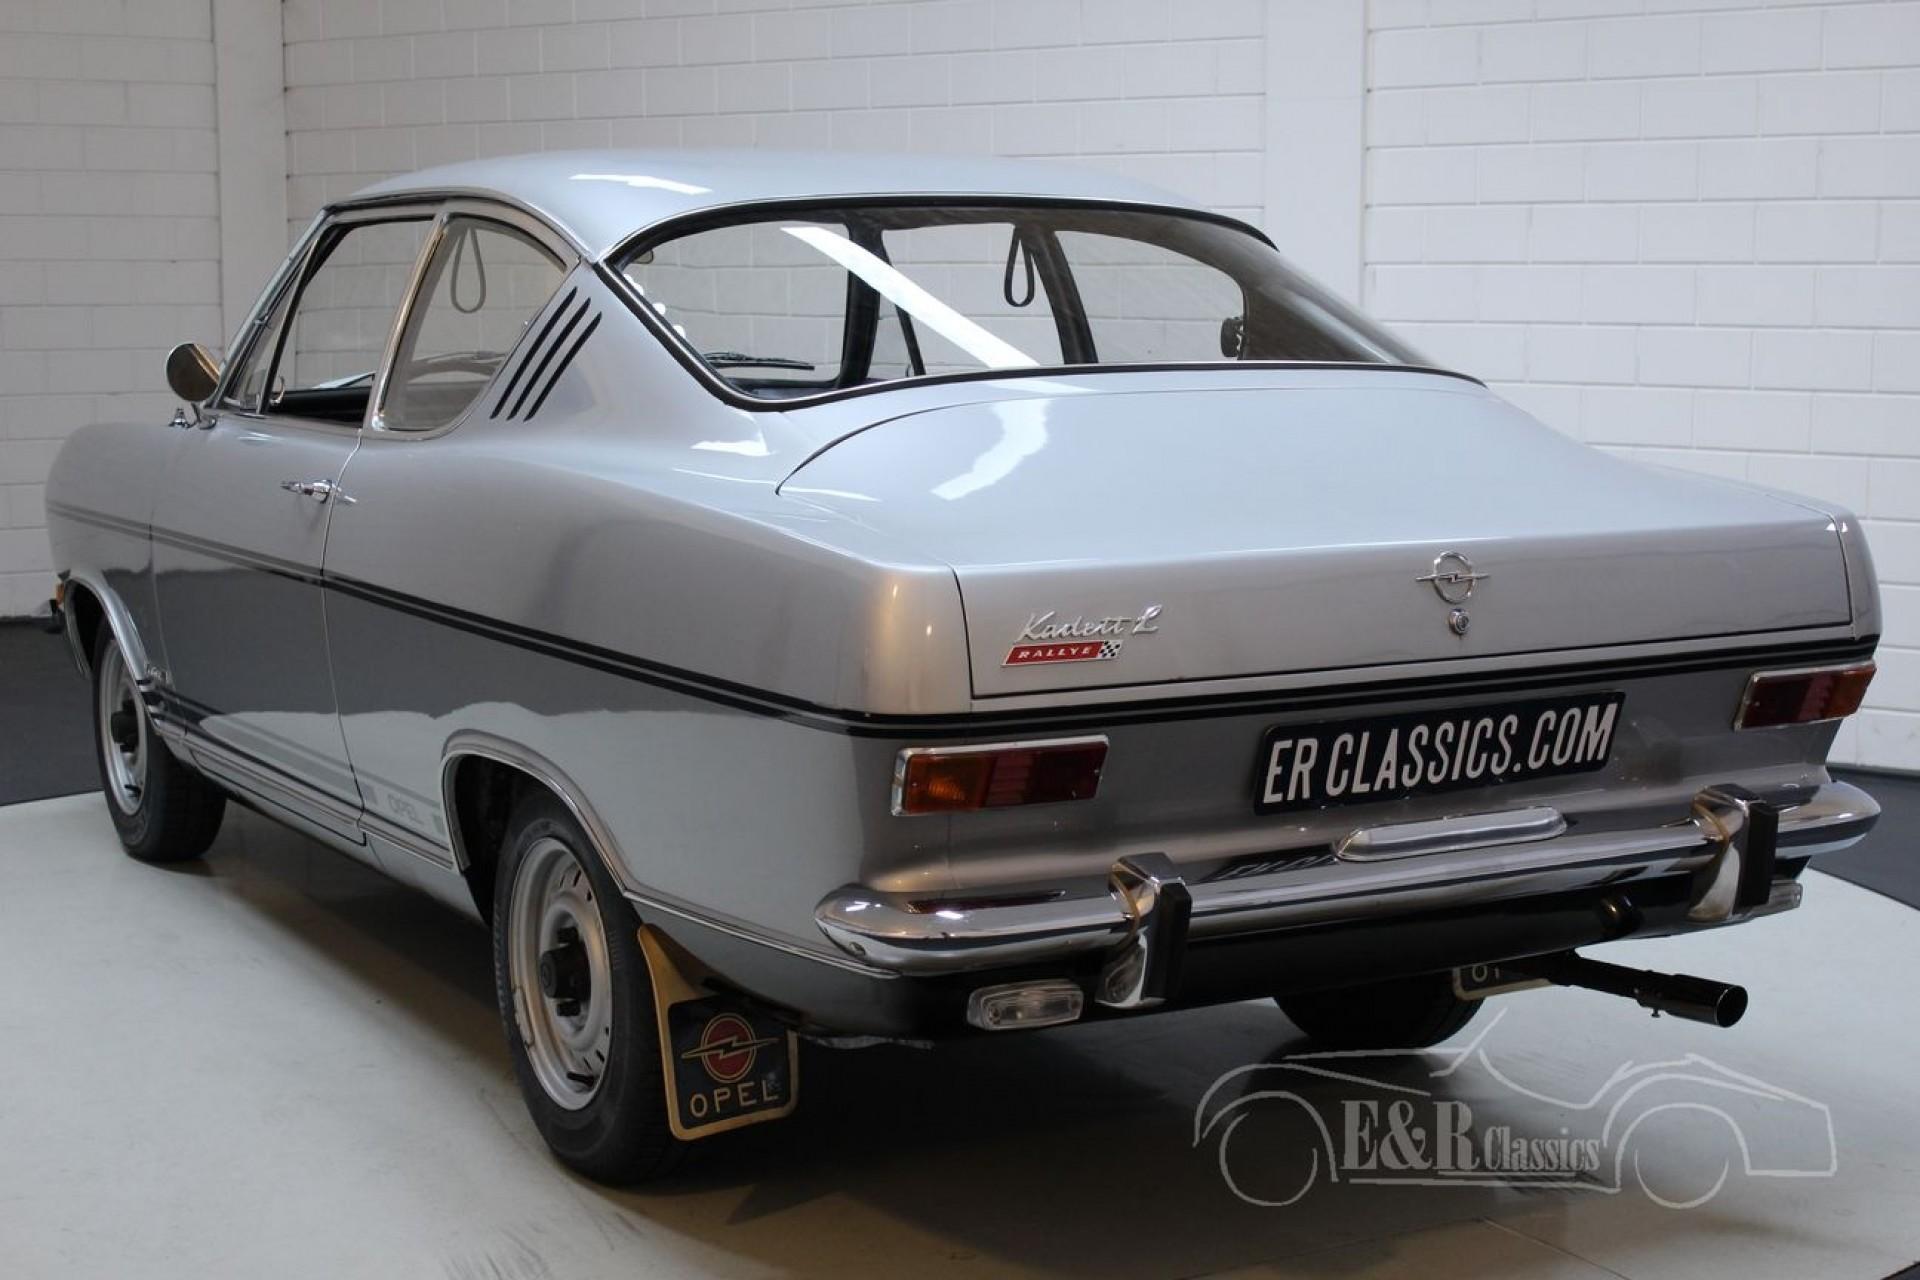 Opel Kadett B Rallye 1967 Rare Model For Sale At Erclassics